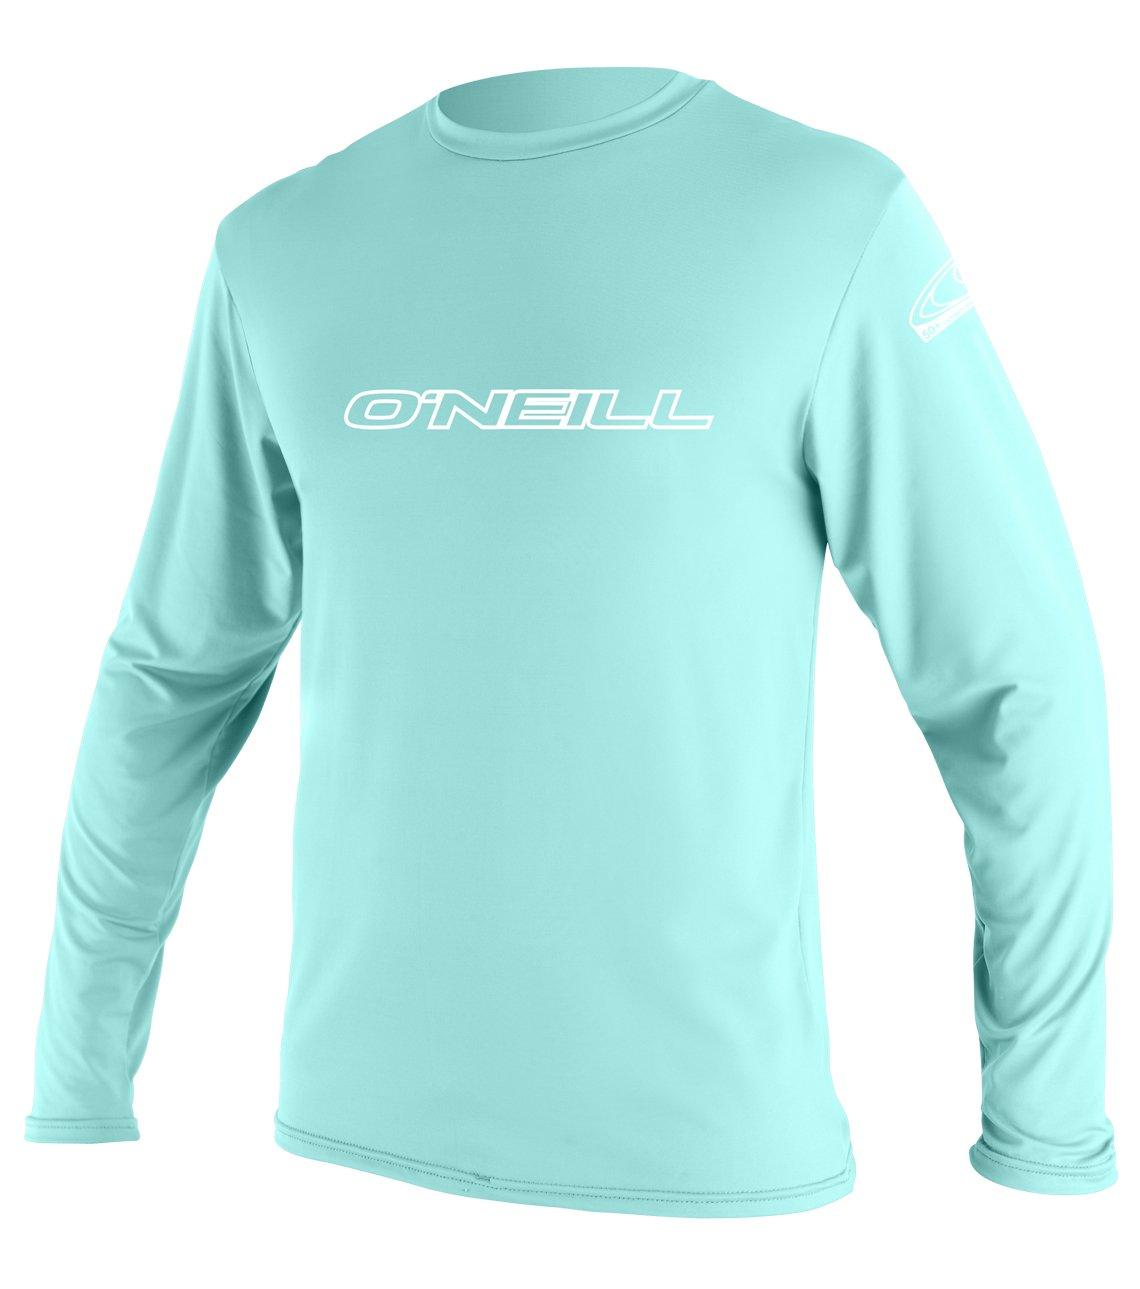 O'Neill Youth Basic Skins UPF 50+ Long Sleeve Sun Shirt, Seaglass, 6